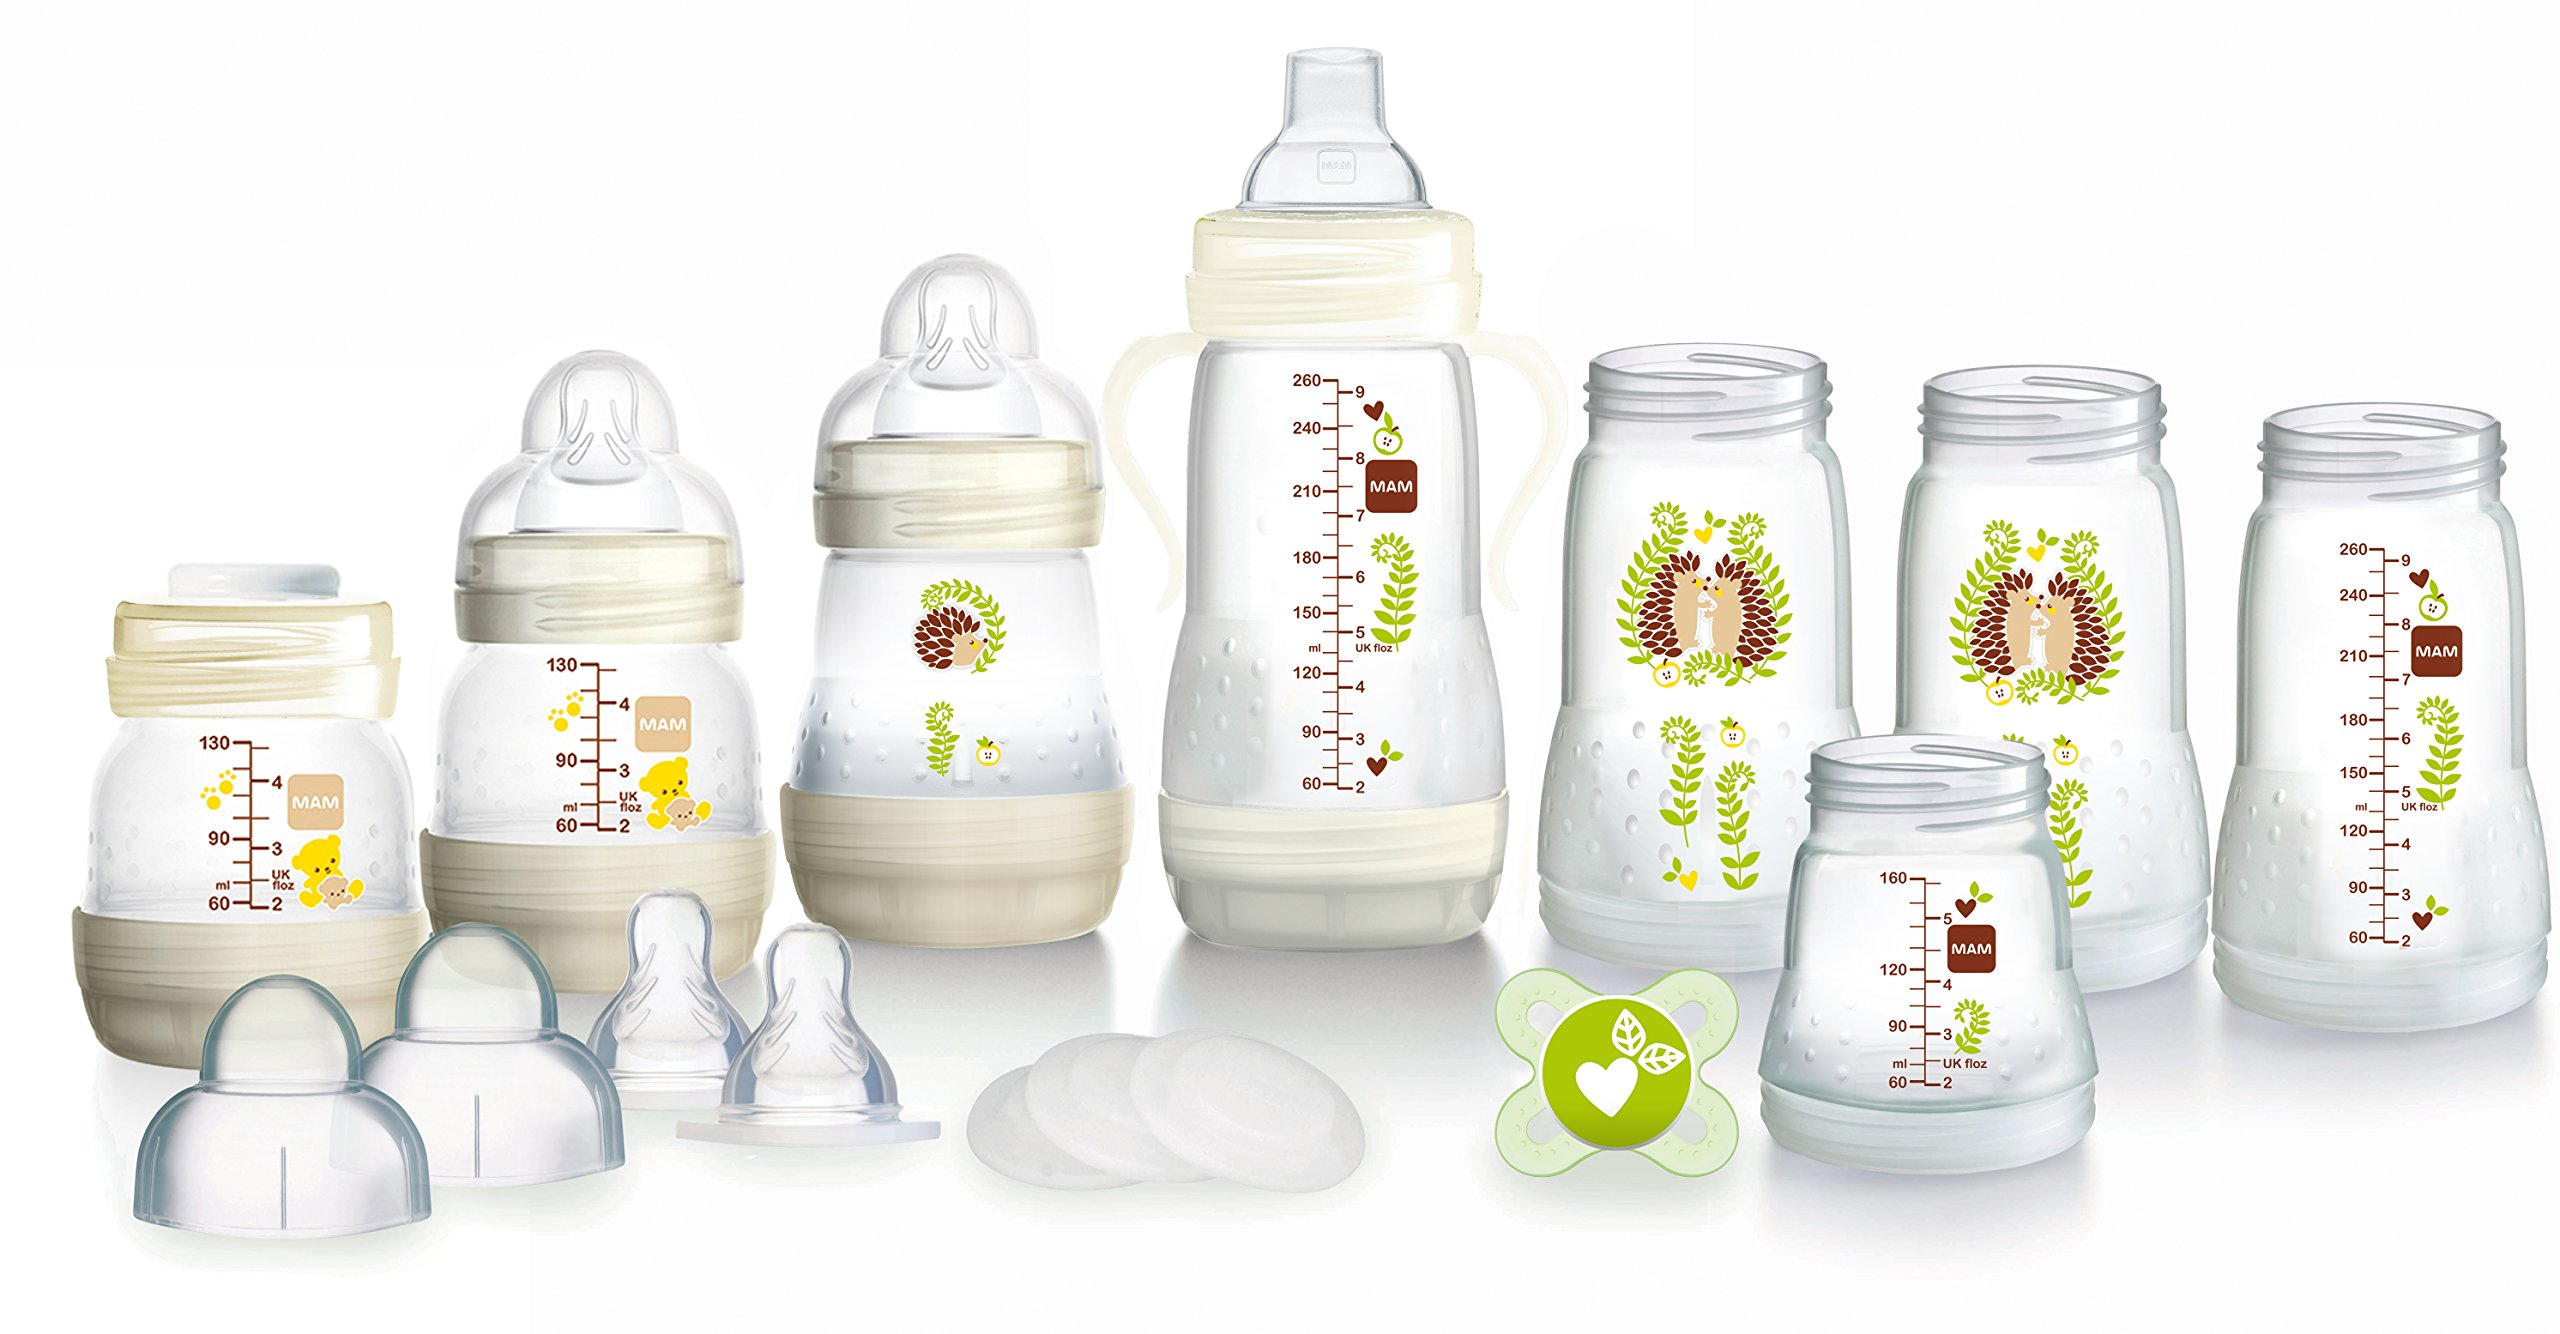 Mam Uk - MAM Self-Sterilising Anti-Colic Bottle Starter Set (Los diseños